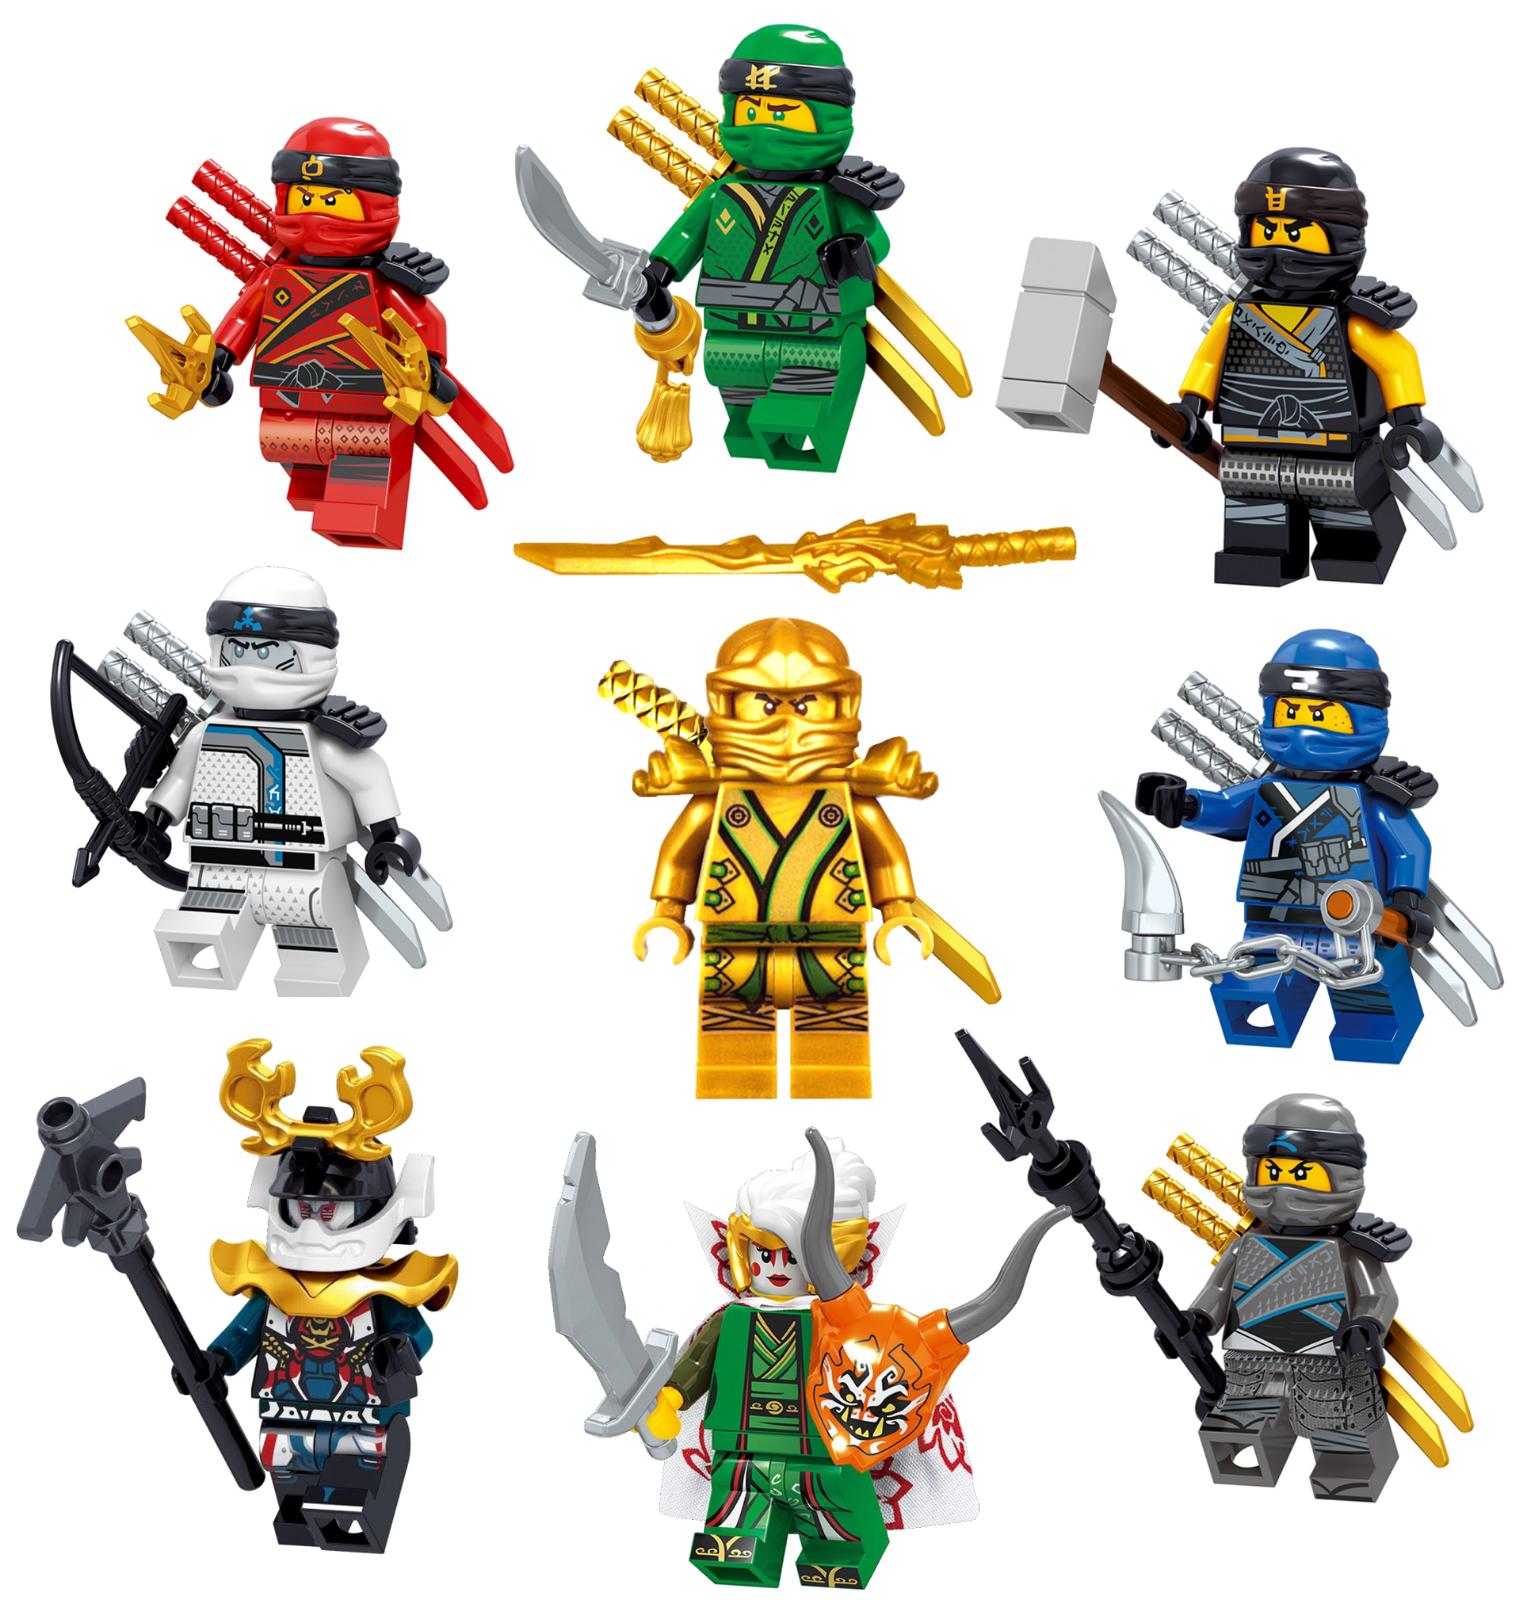 24pcs Ninjago Minifigures For Lego Building Blocks Toys Action Figures Gift Kai